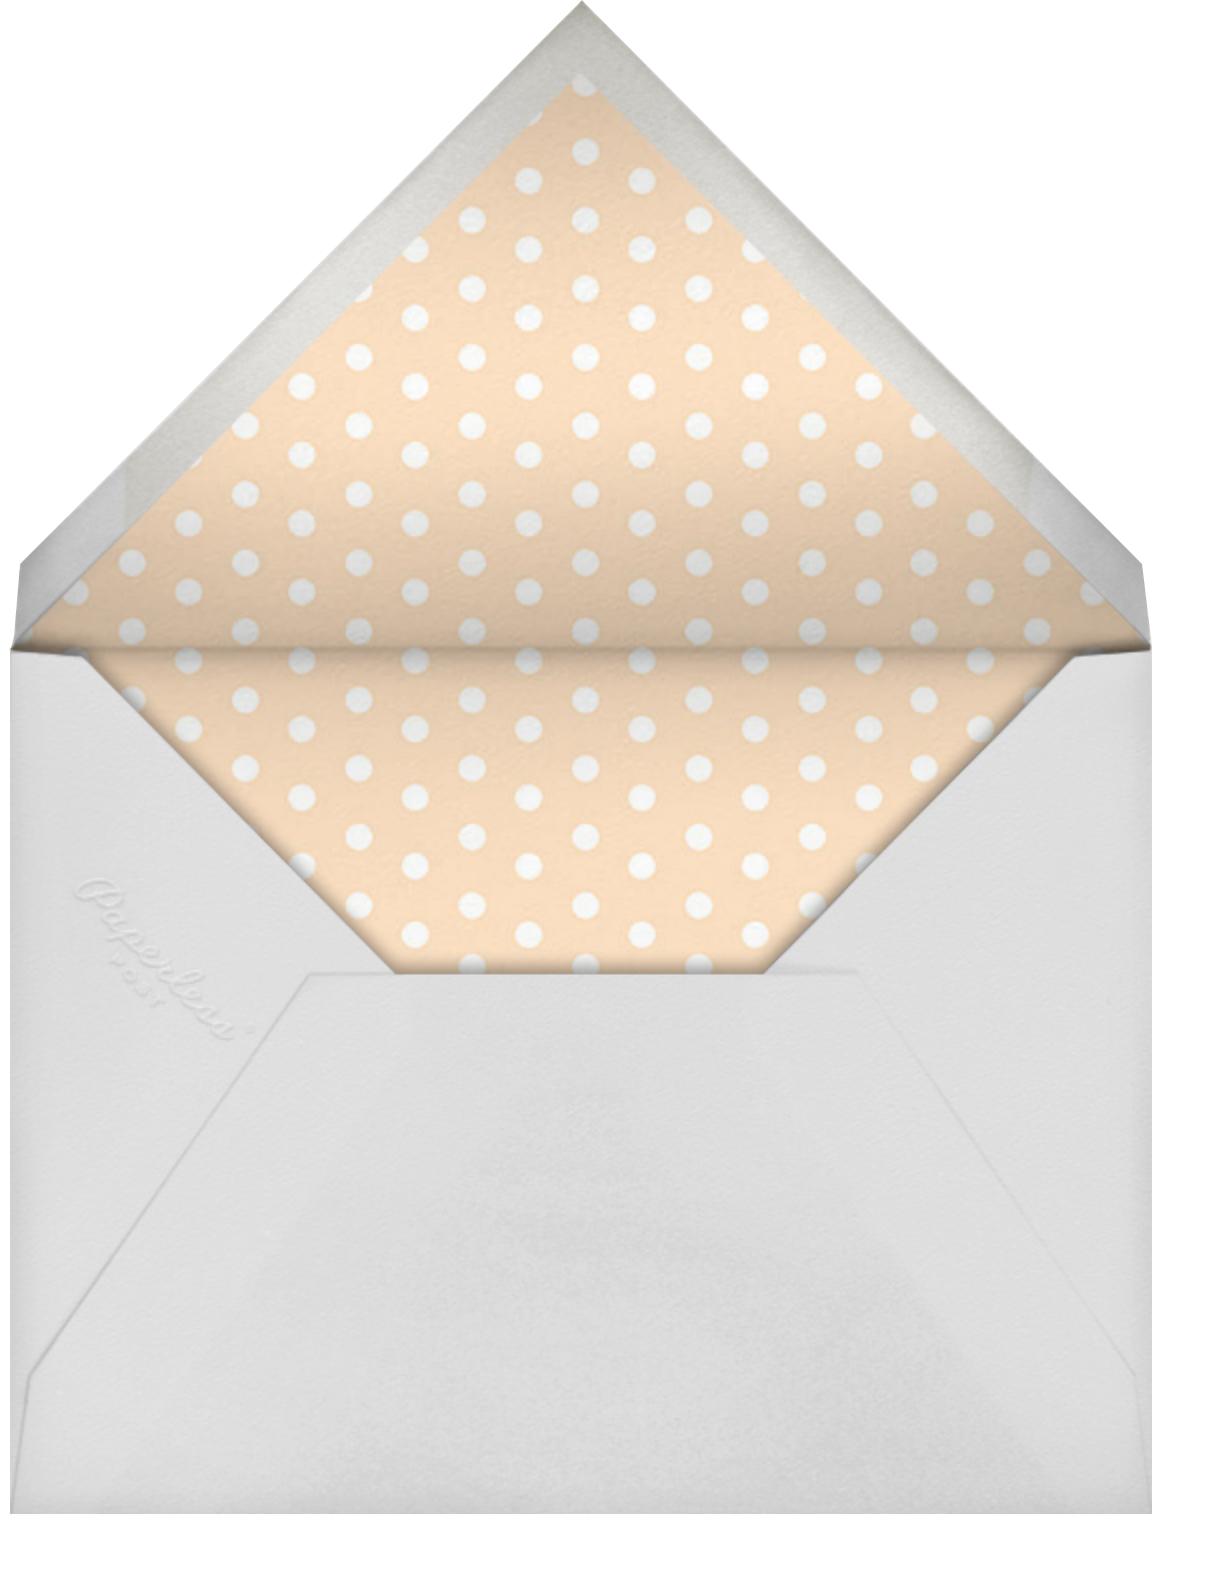 Marguerite Floral - Rifle Paper Co. - General entertaining - envelope back